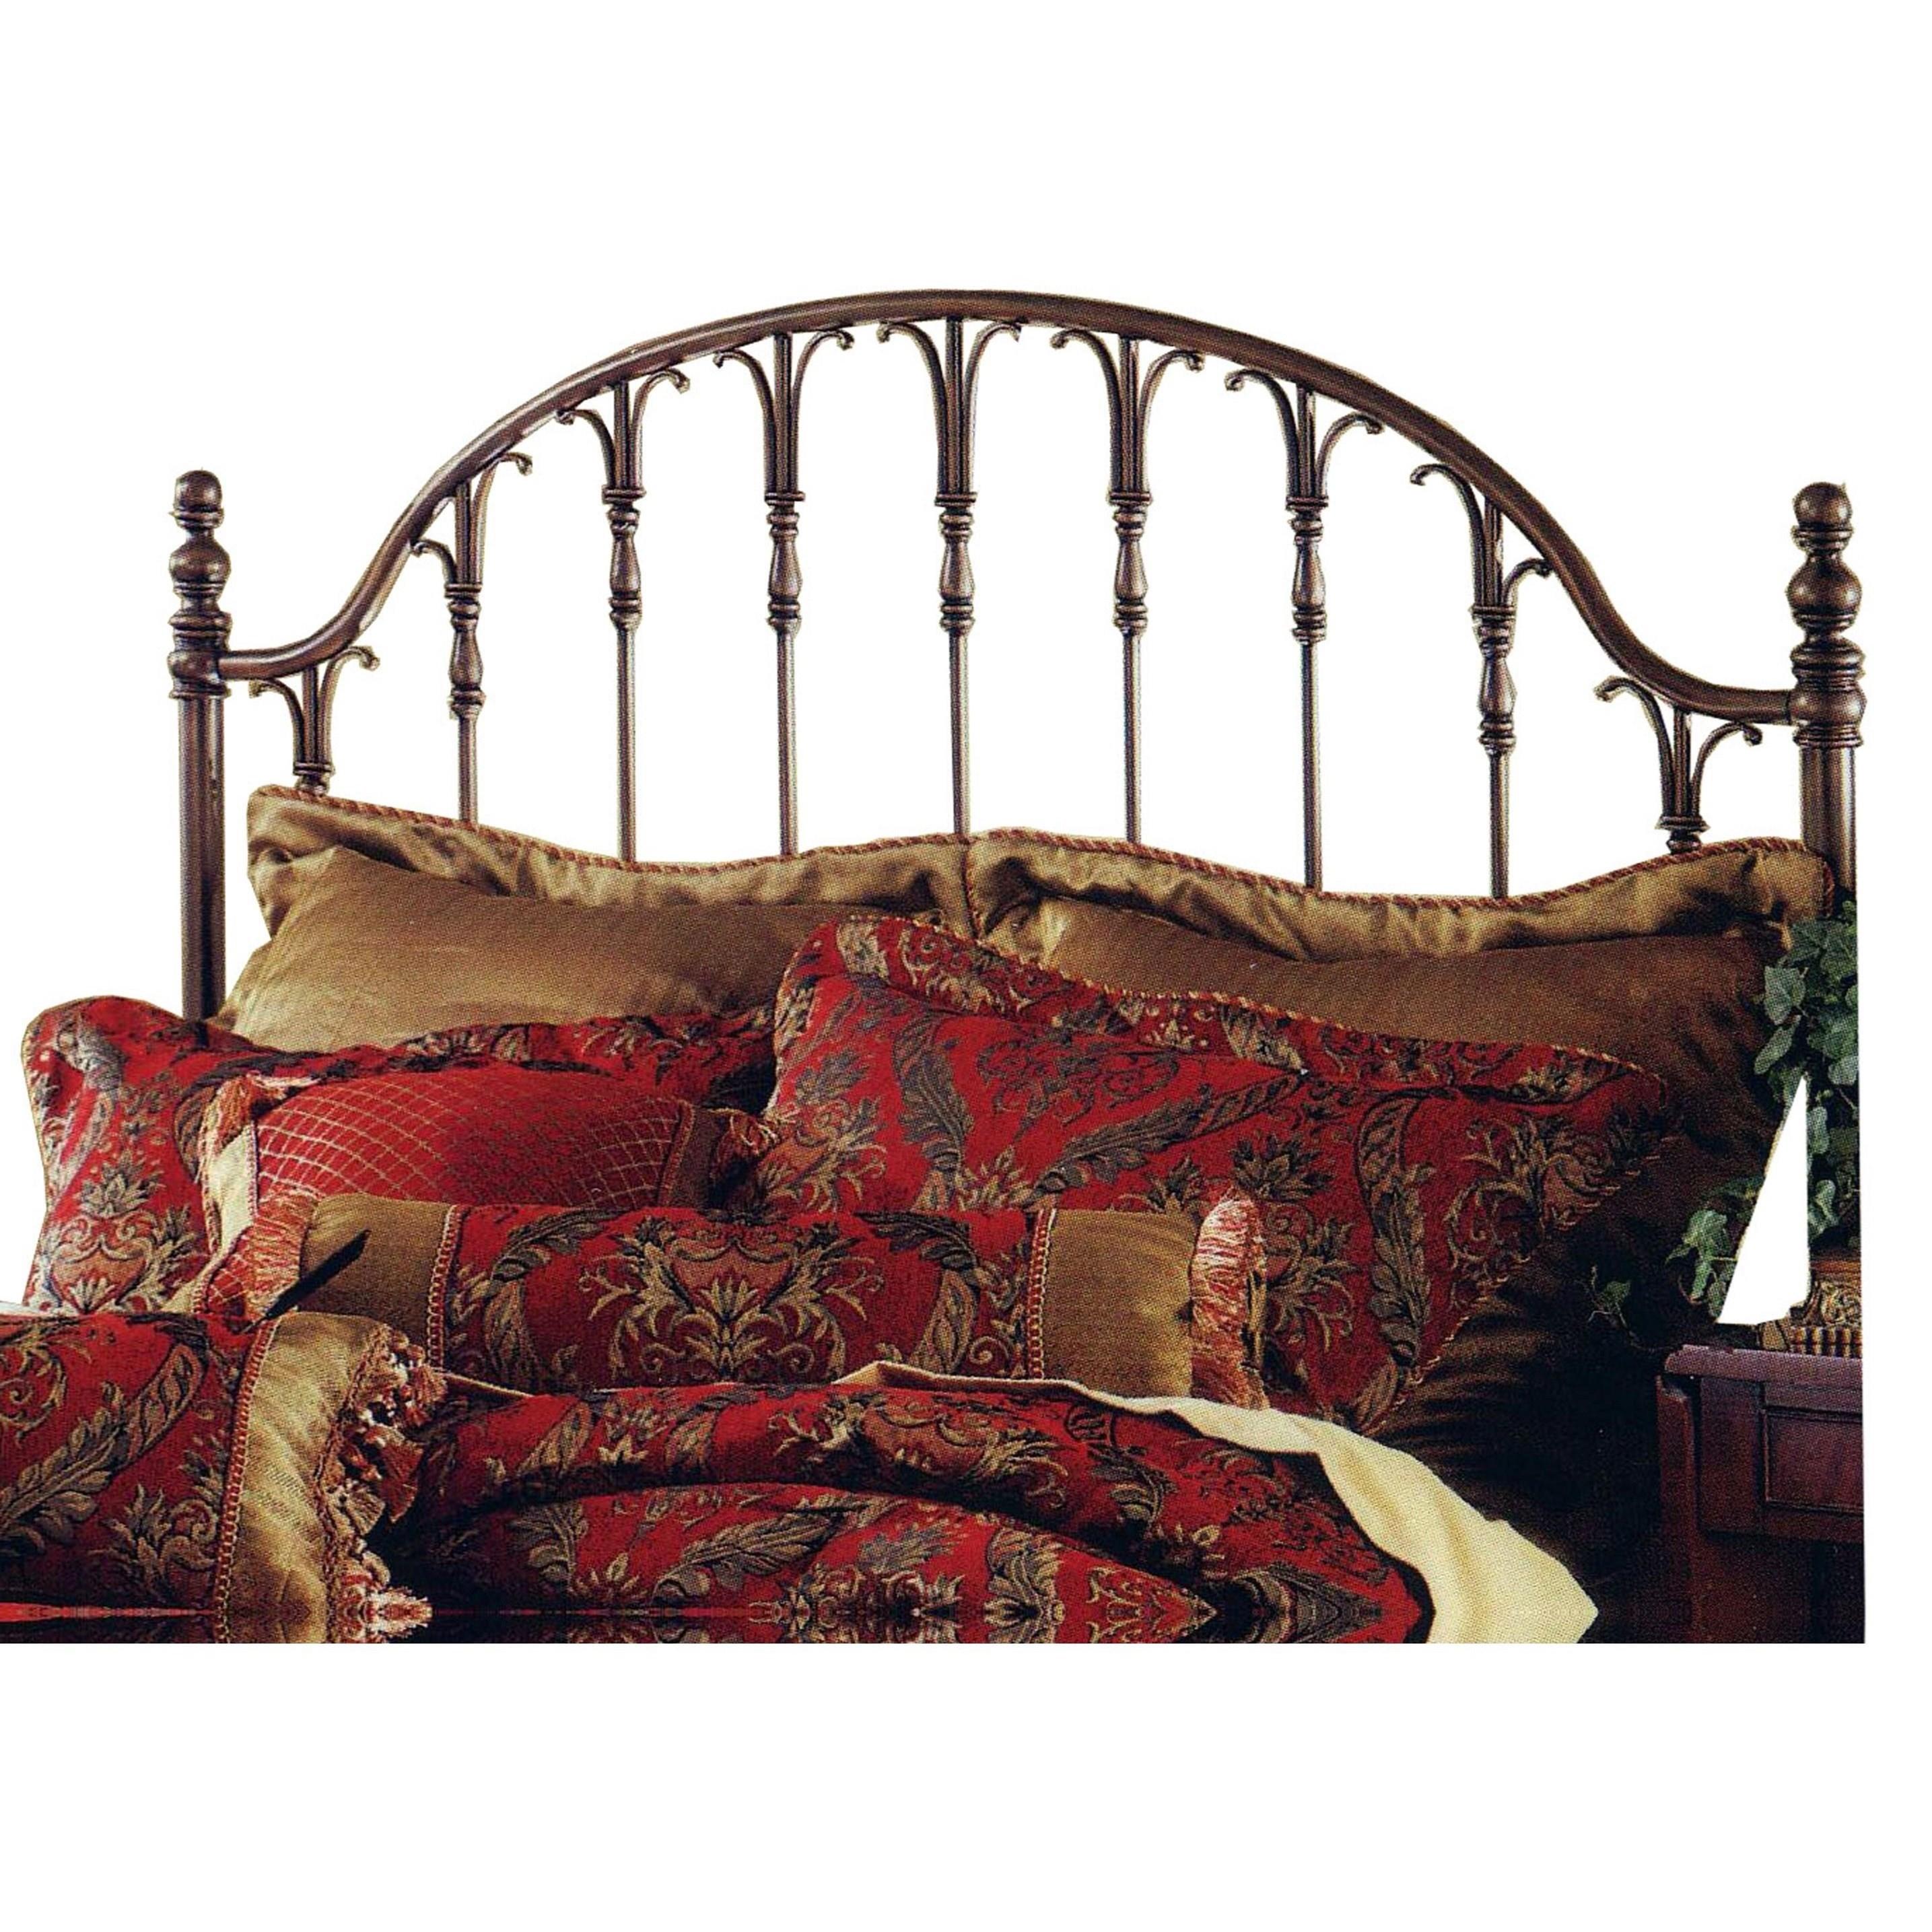 Hillsdale Metal Beds Full/Queen Tyler Headboard - Item Number: 1239HFQR